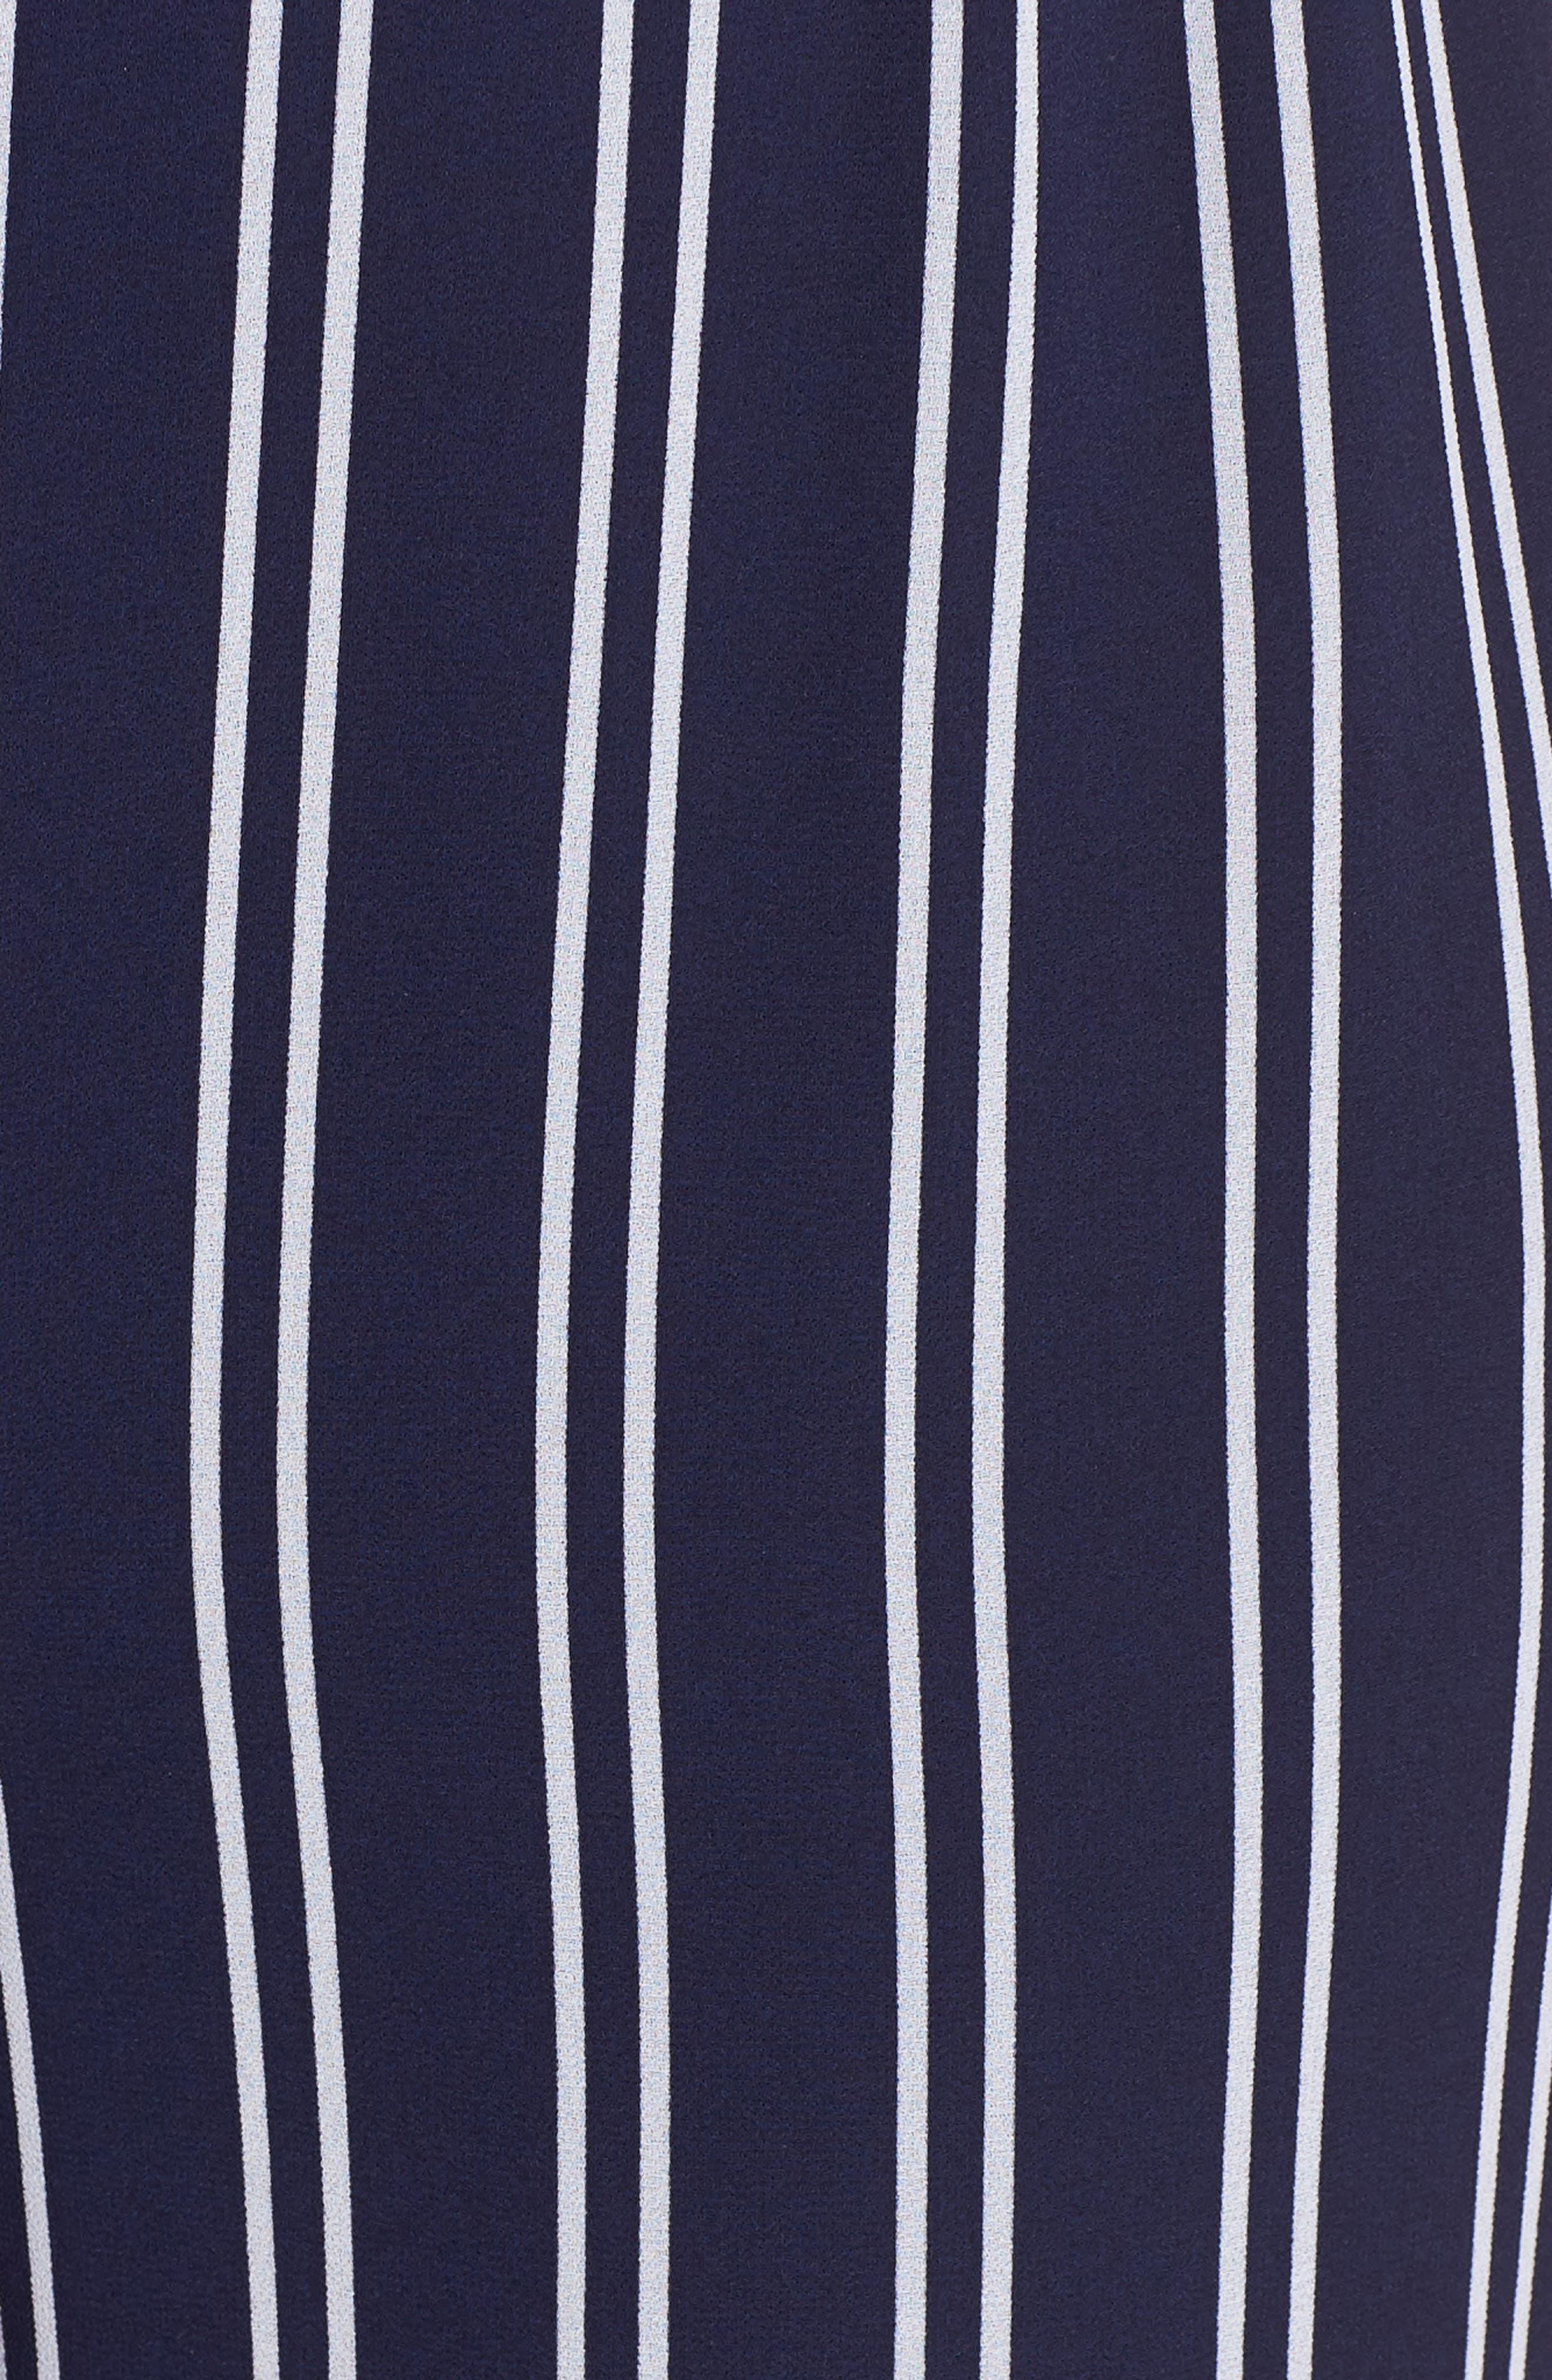 MICHAEL MICHAEL KORS, Mega Railroad Stripe Jumpsuit, Alternate thumbnail 6, color, 400